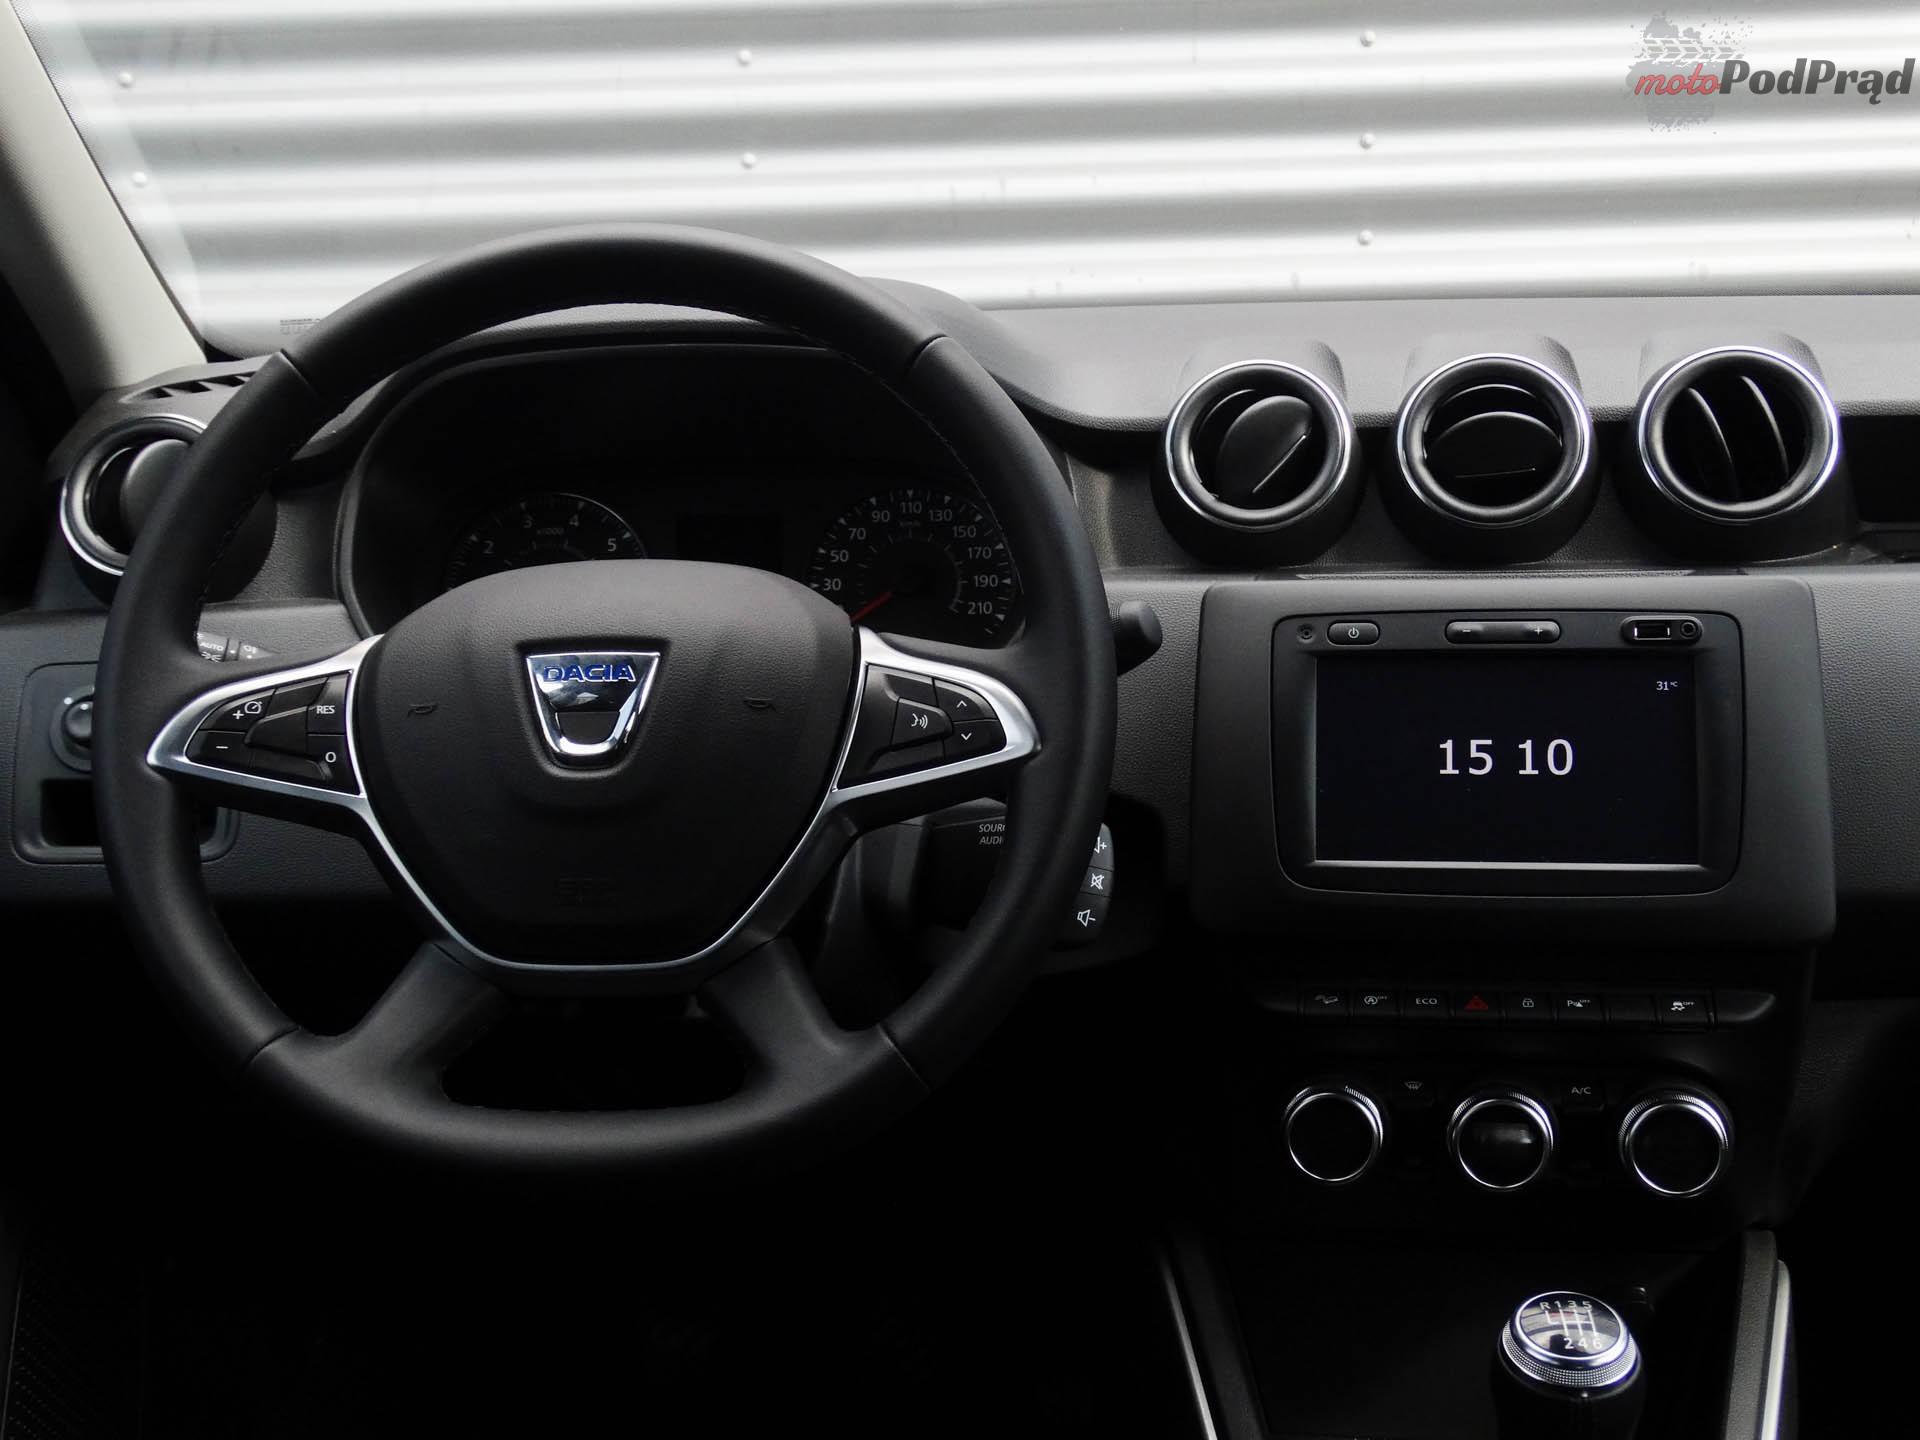 Dacia Duster 13 Test: Dacia Duster PRESTIGE 1.5 dci 4WD – w prostocie siła!